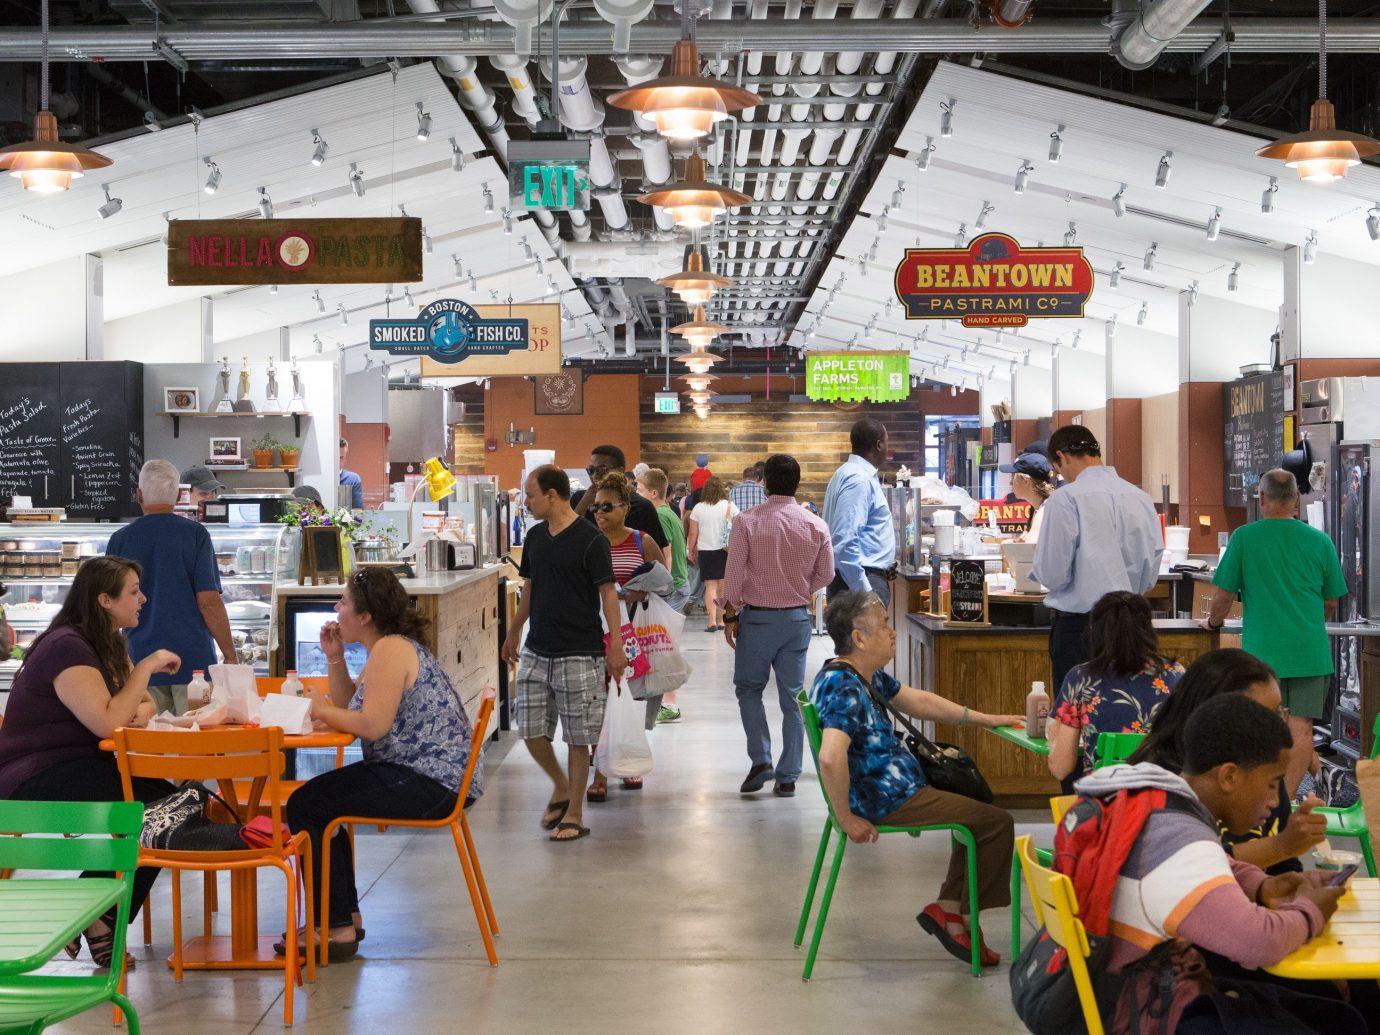 Summer Series indoor person floor public space City market fair